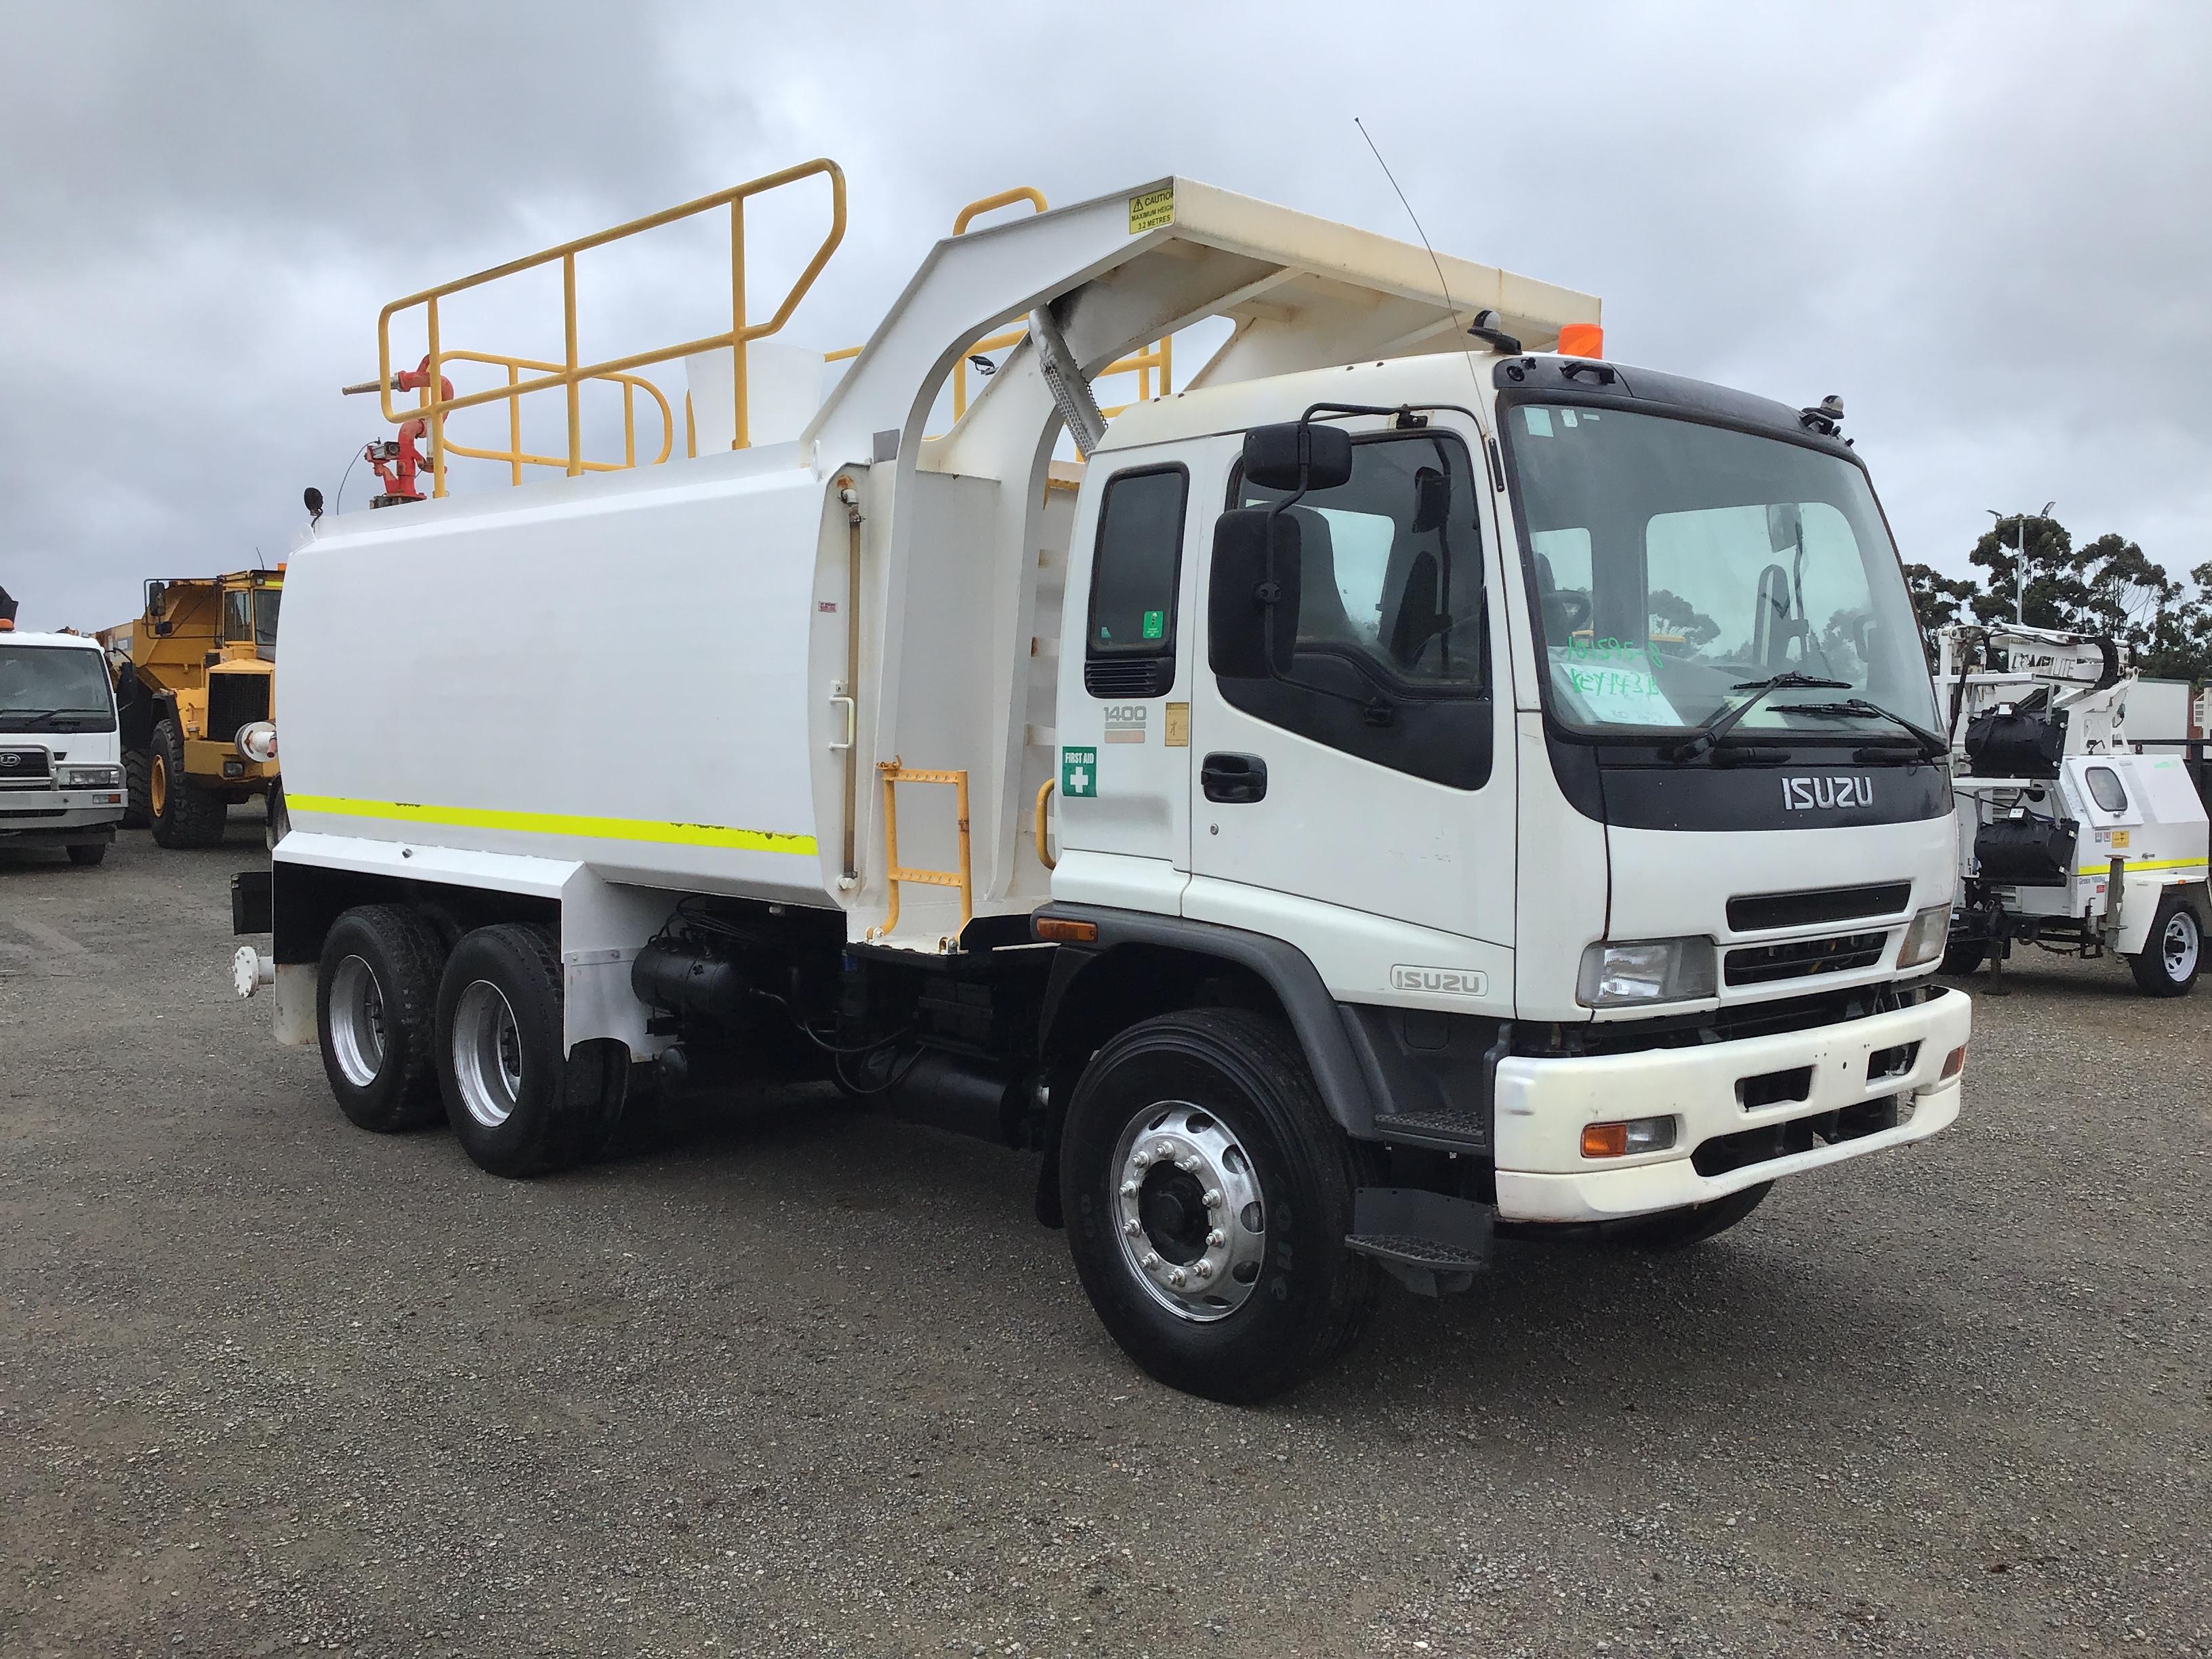 2007 Isuzu FVZ 1400 6 x 4 Water Truck